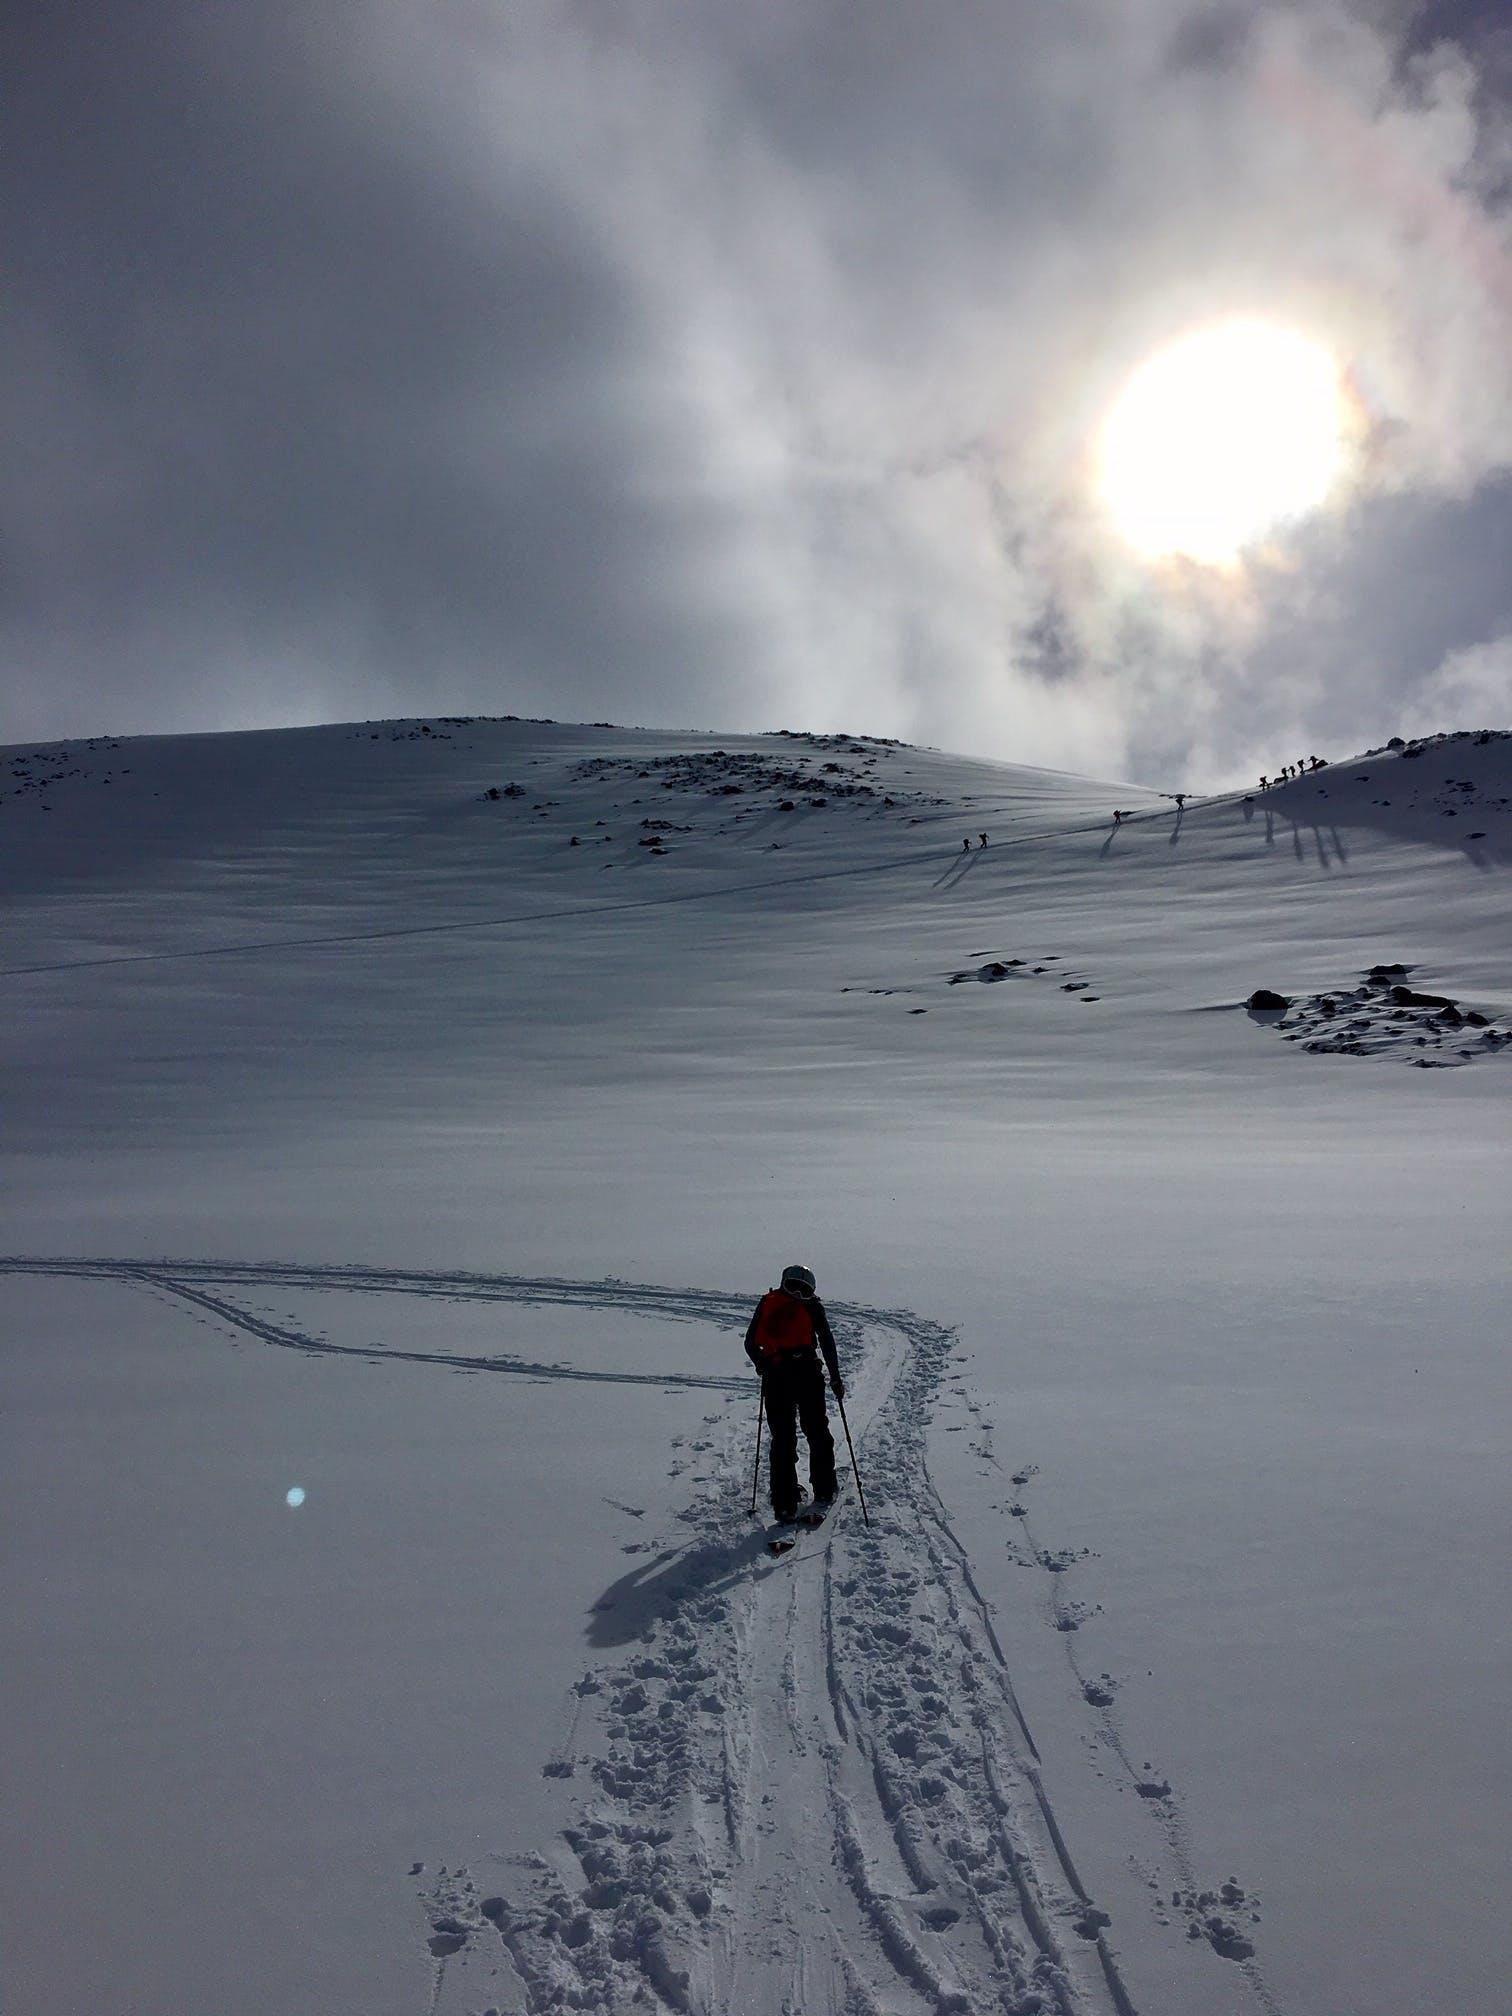 Splitboarder hiking Dalvik Iceland